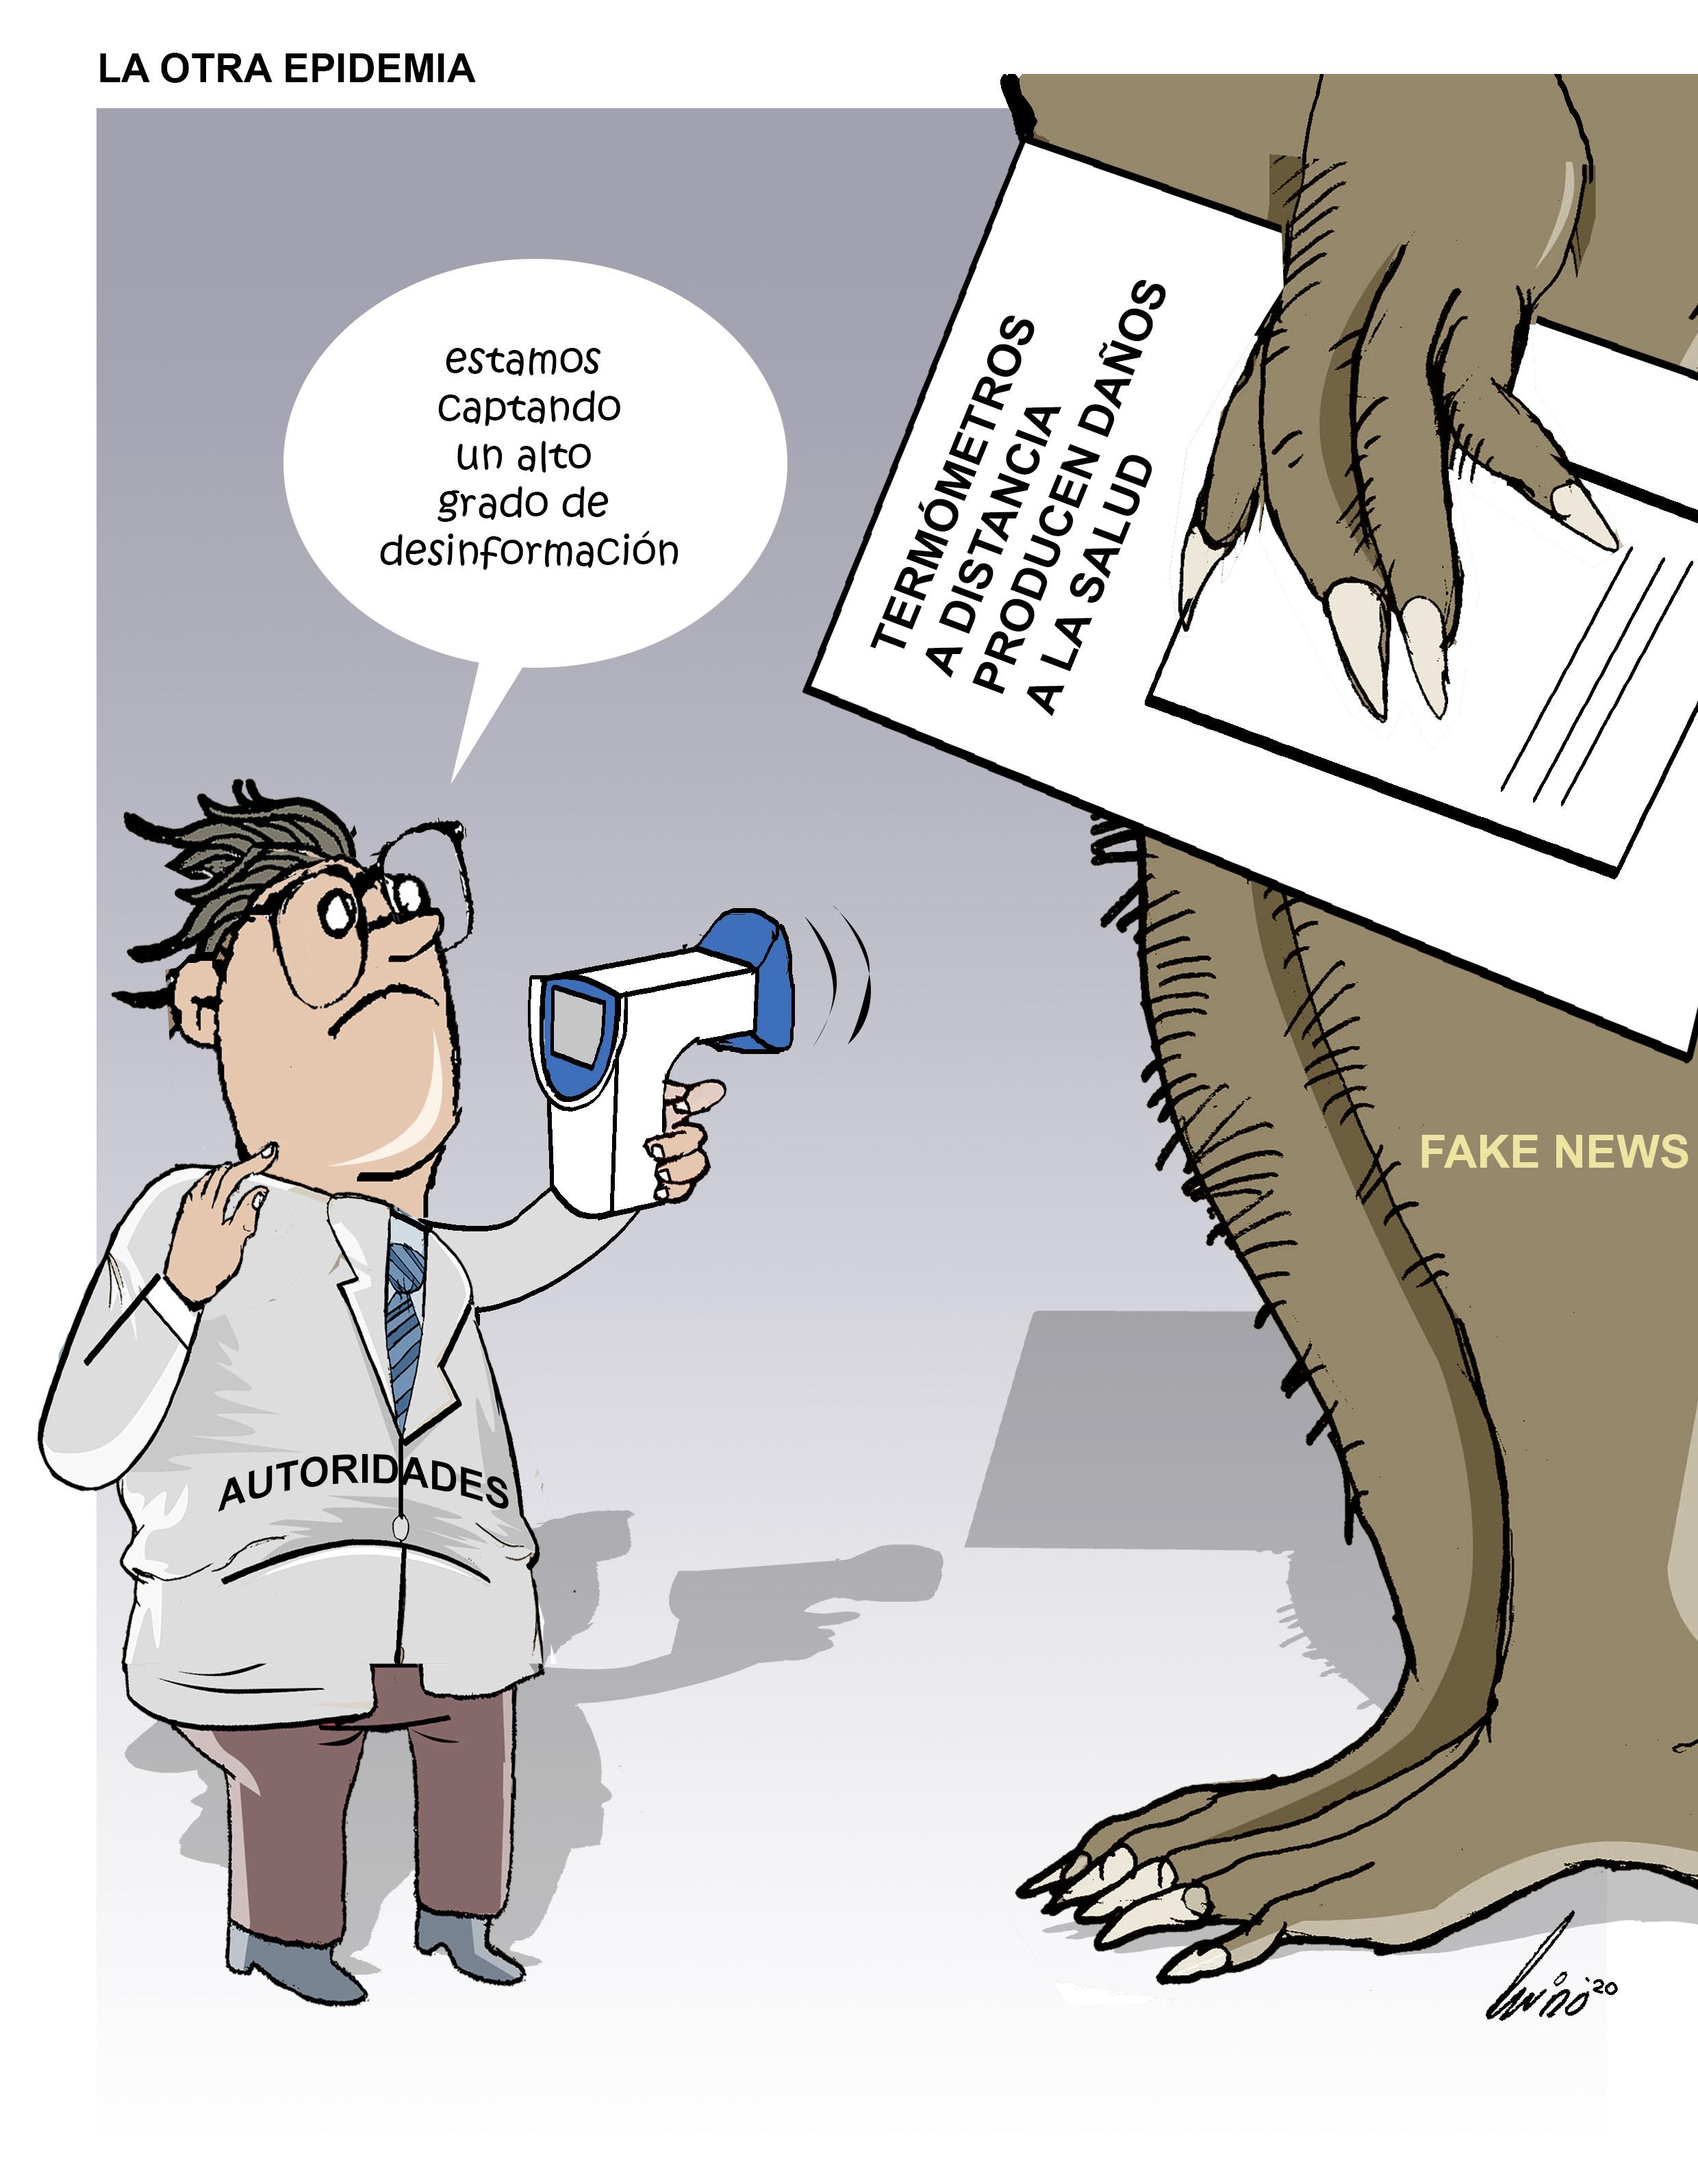 La otra pandemia